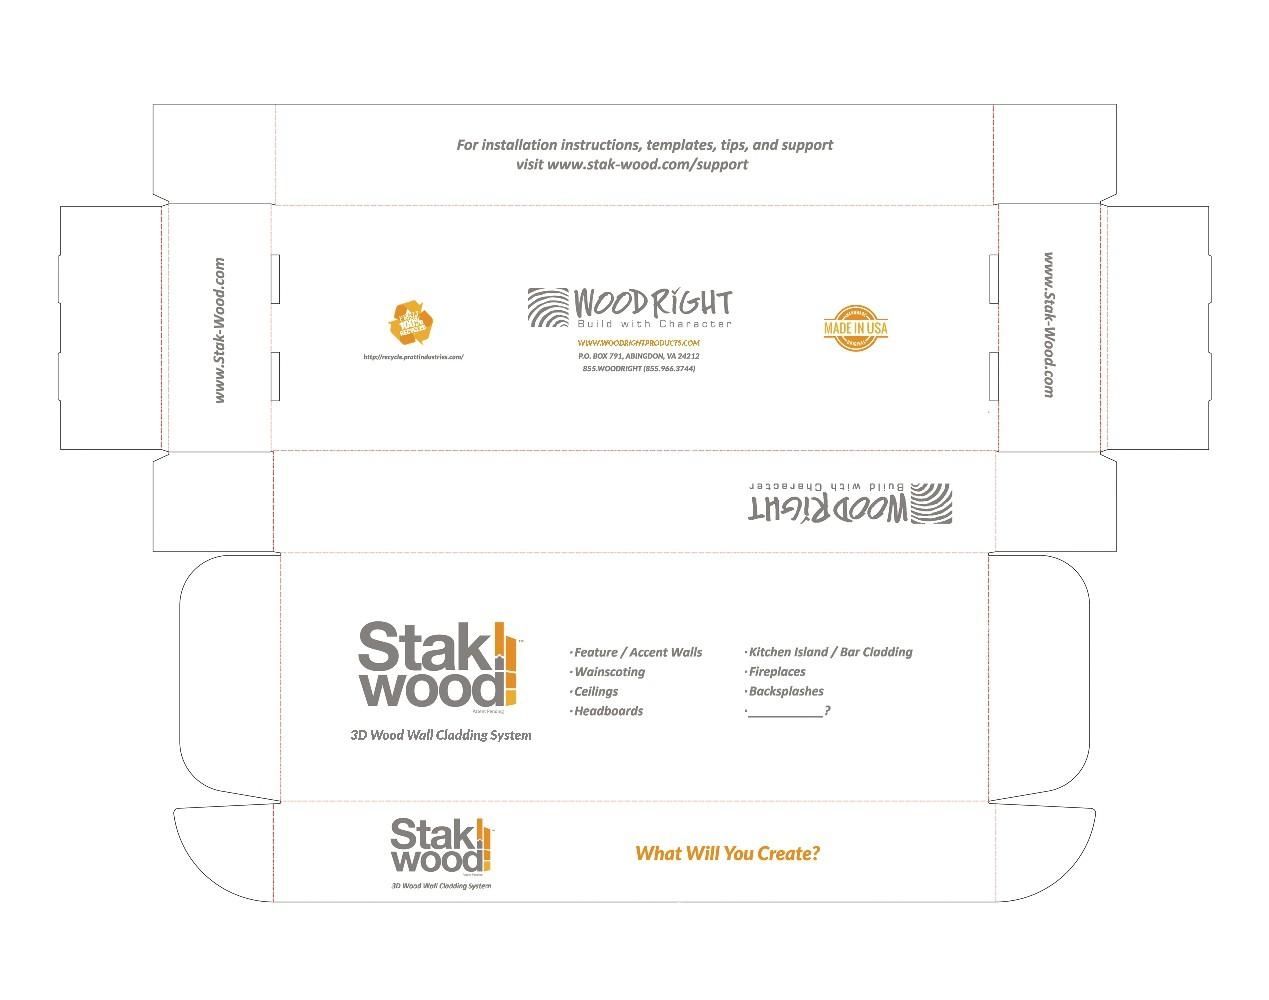 StakWood Retail Box Design Edits v2